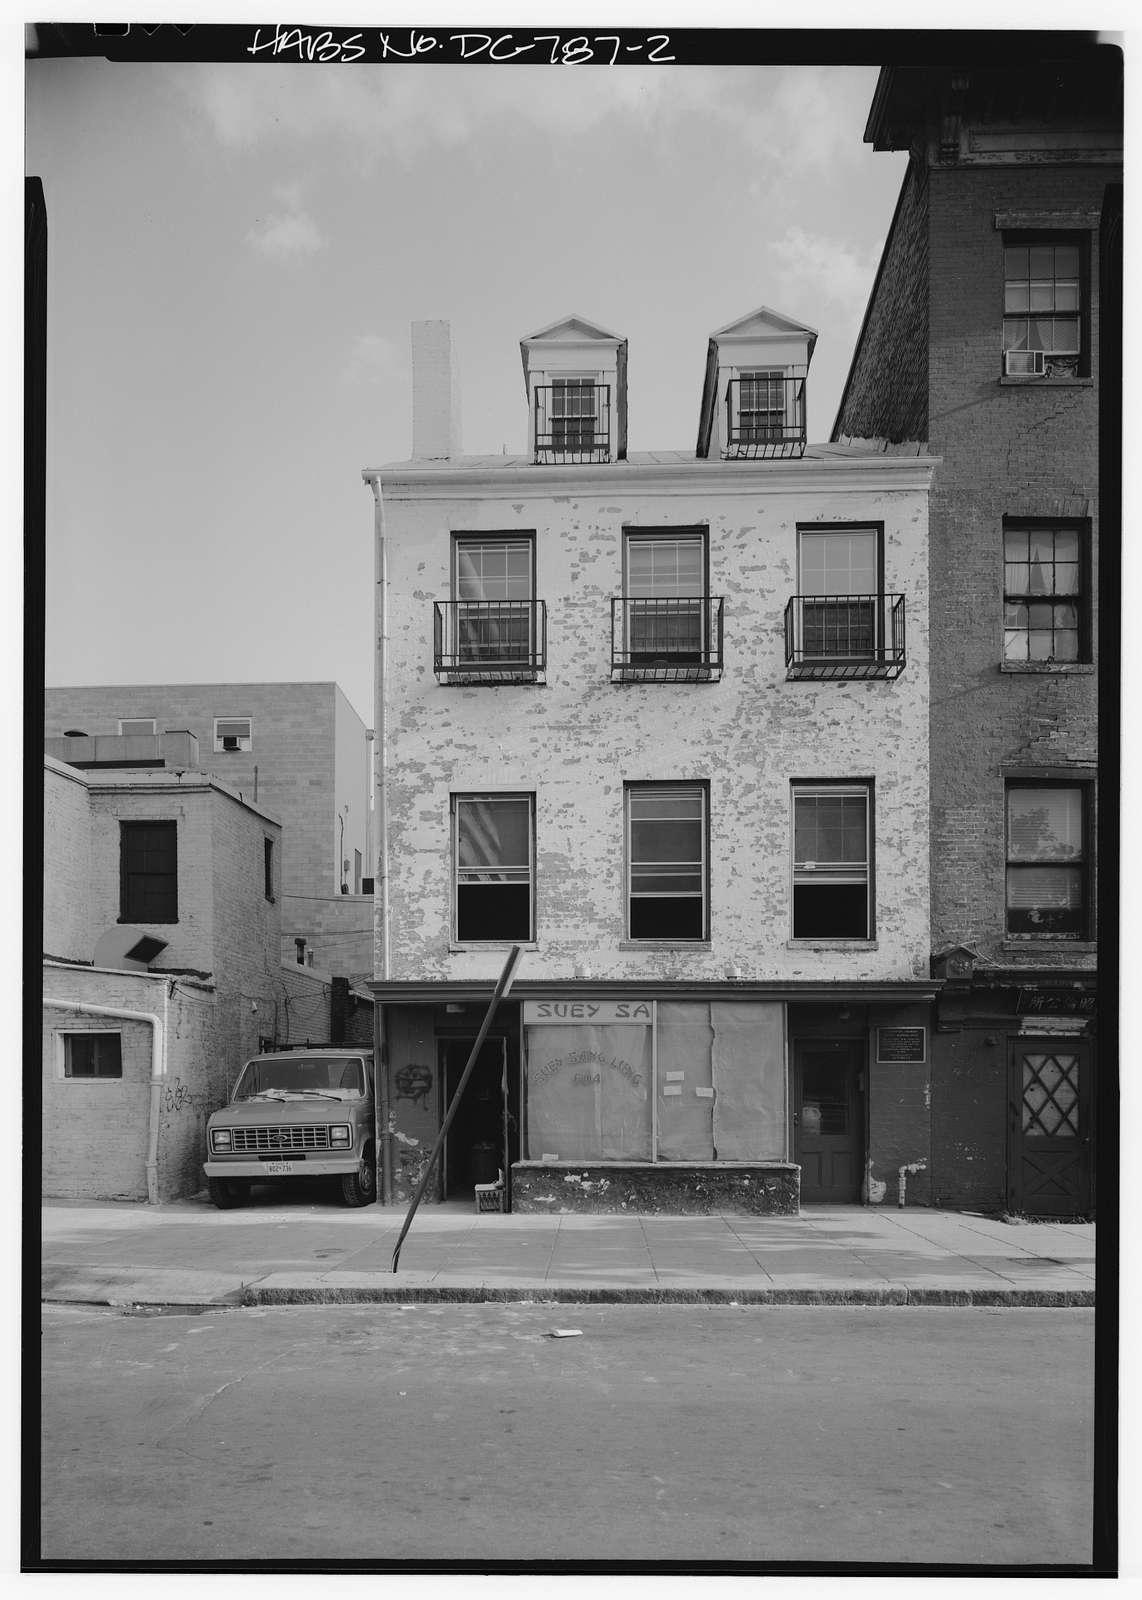 Mary Surratt Boarding House, 604 H Street, Northwest, Washington, District of Columbia, DC